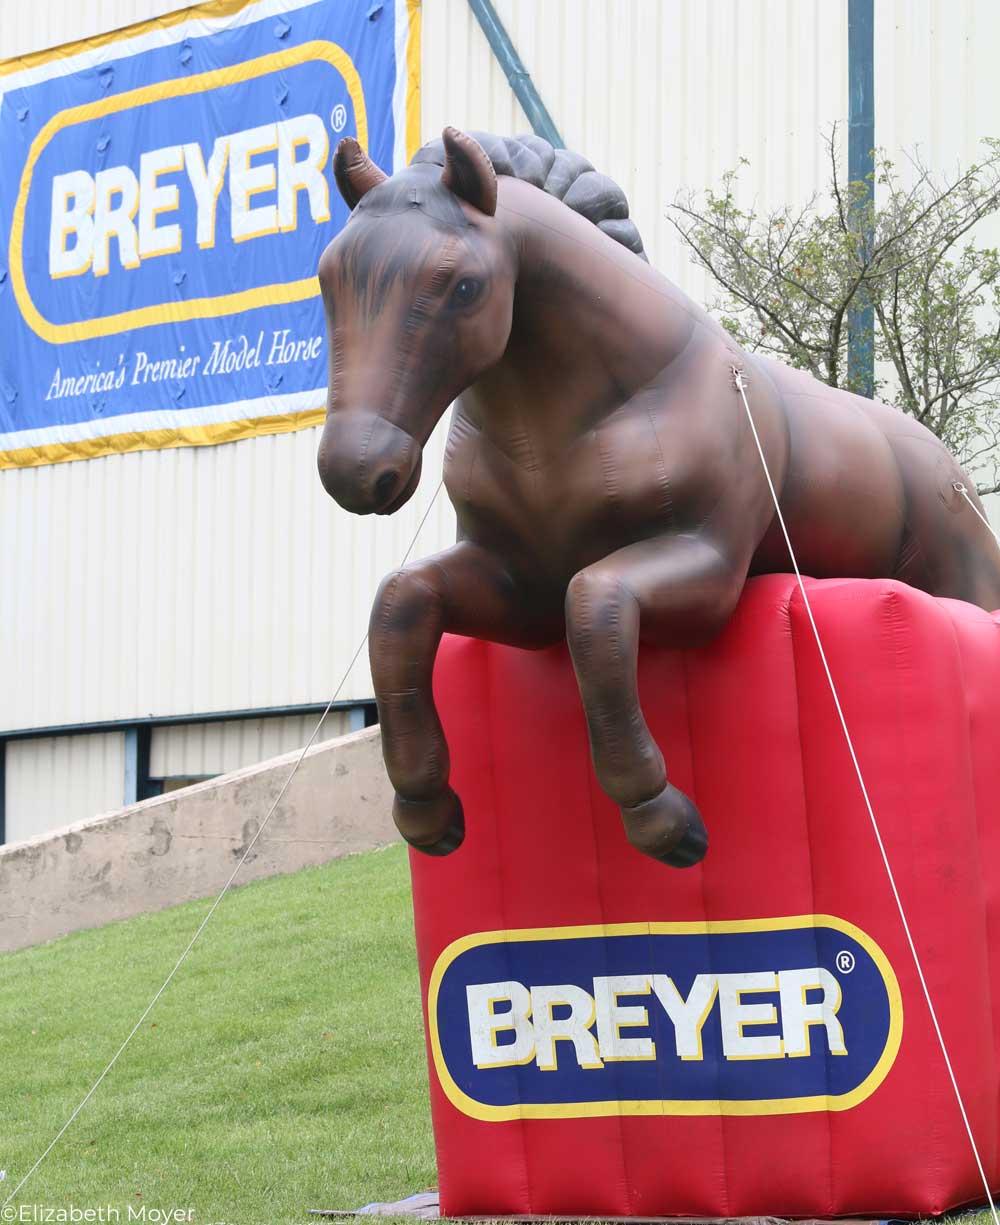 Fluffy, the inflatable BreyerFest horse